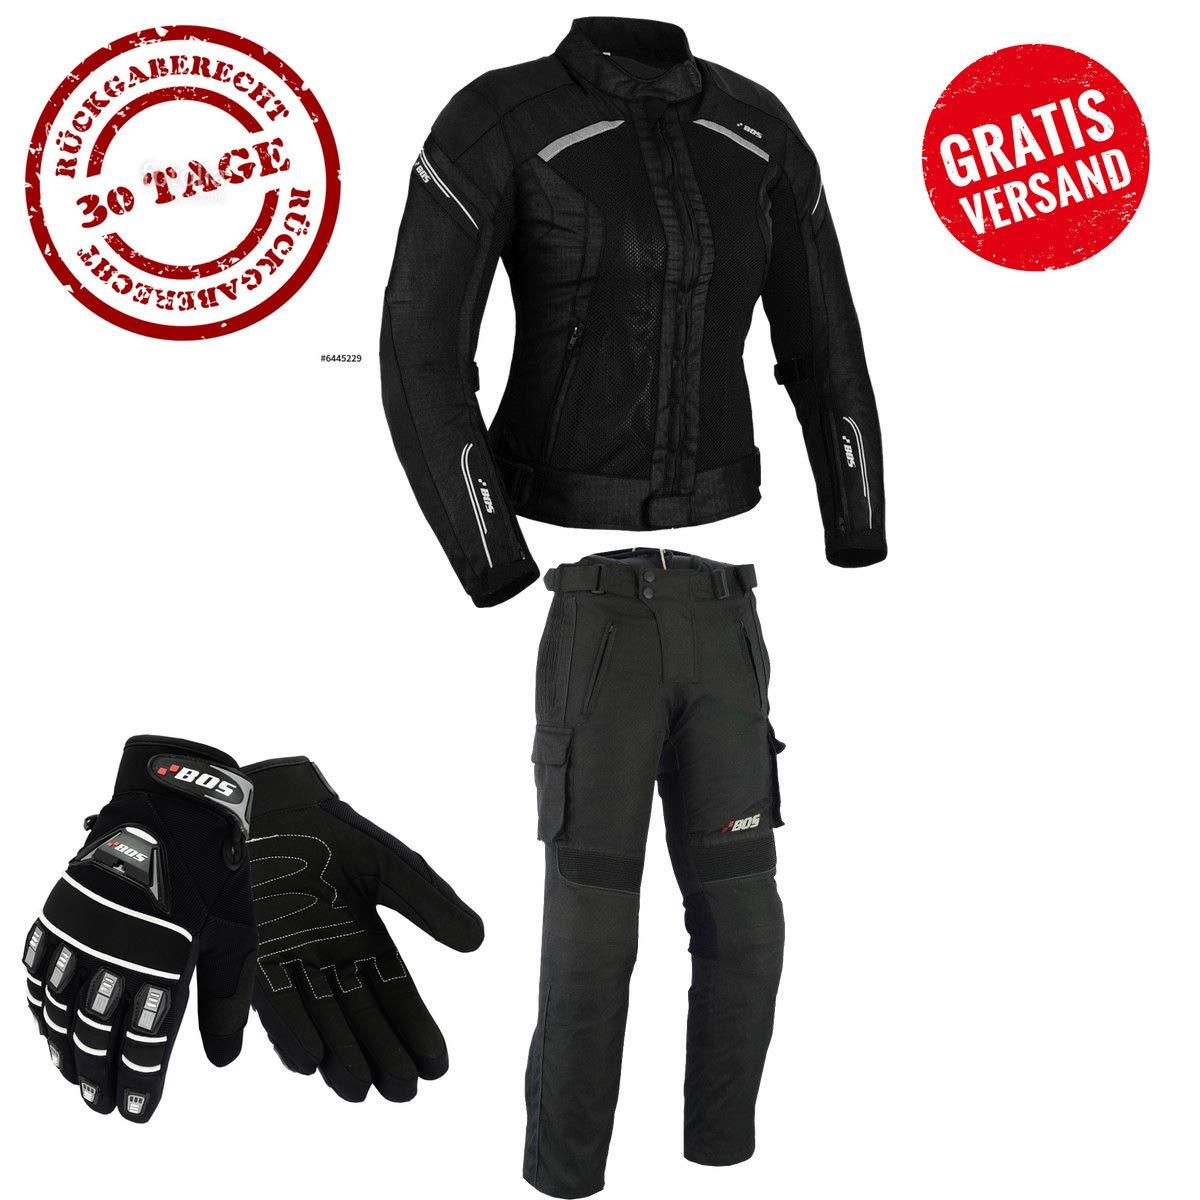 Motocicleta Rocker Touring guantes Traje de motociclismo para mujer M pantalones chaqueta